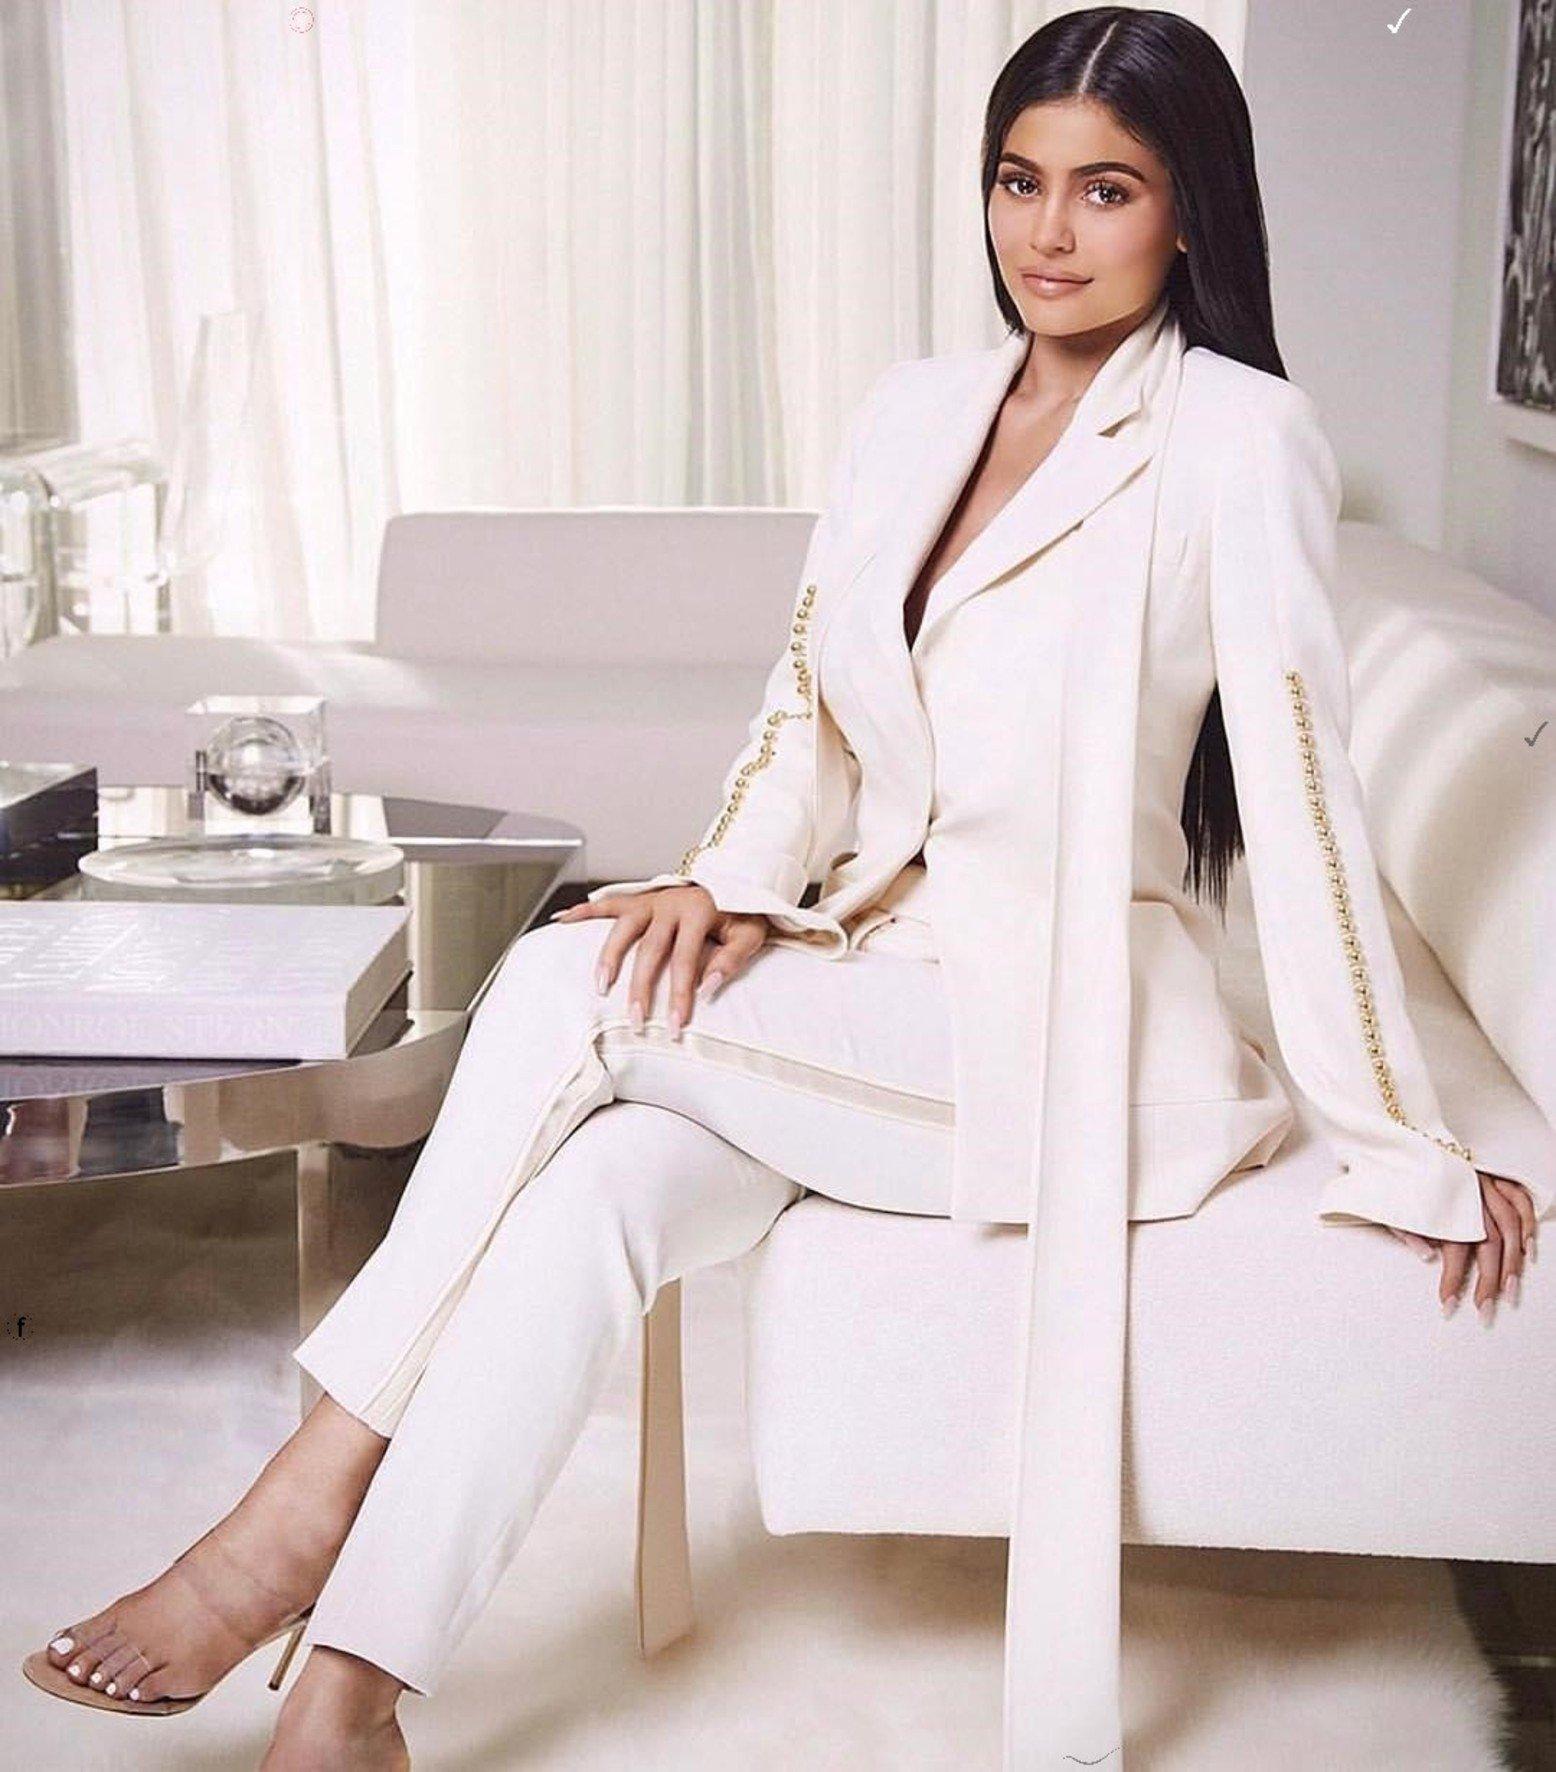 Kylie Jenner (kyliejenner / 09.08.2017):